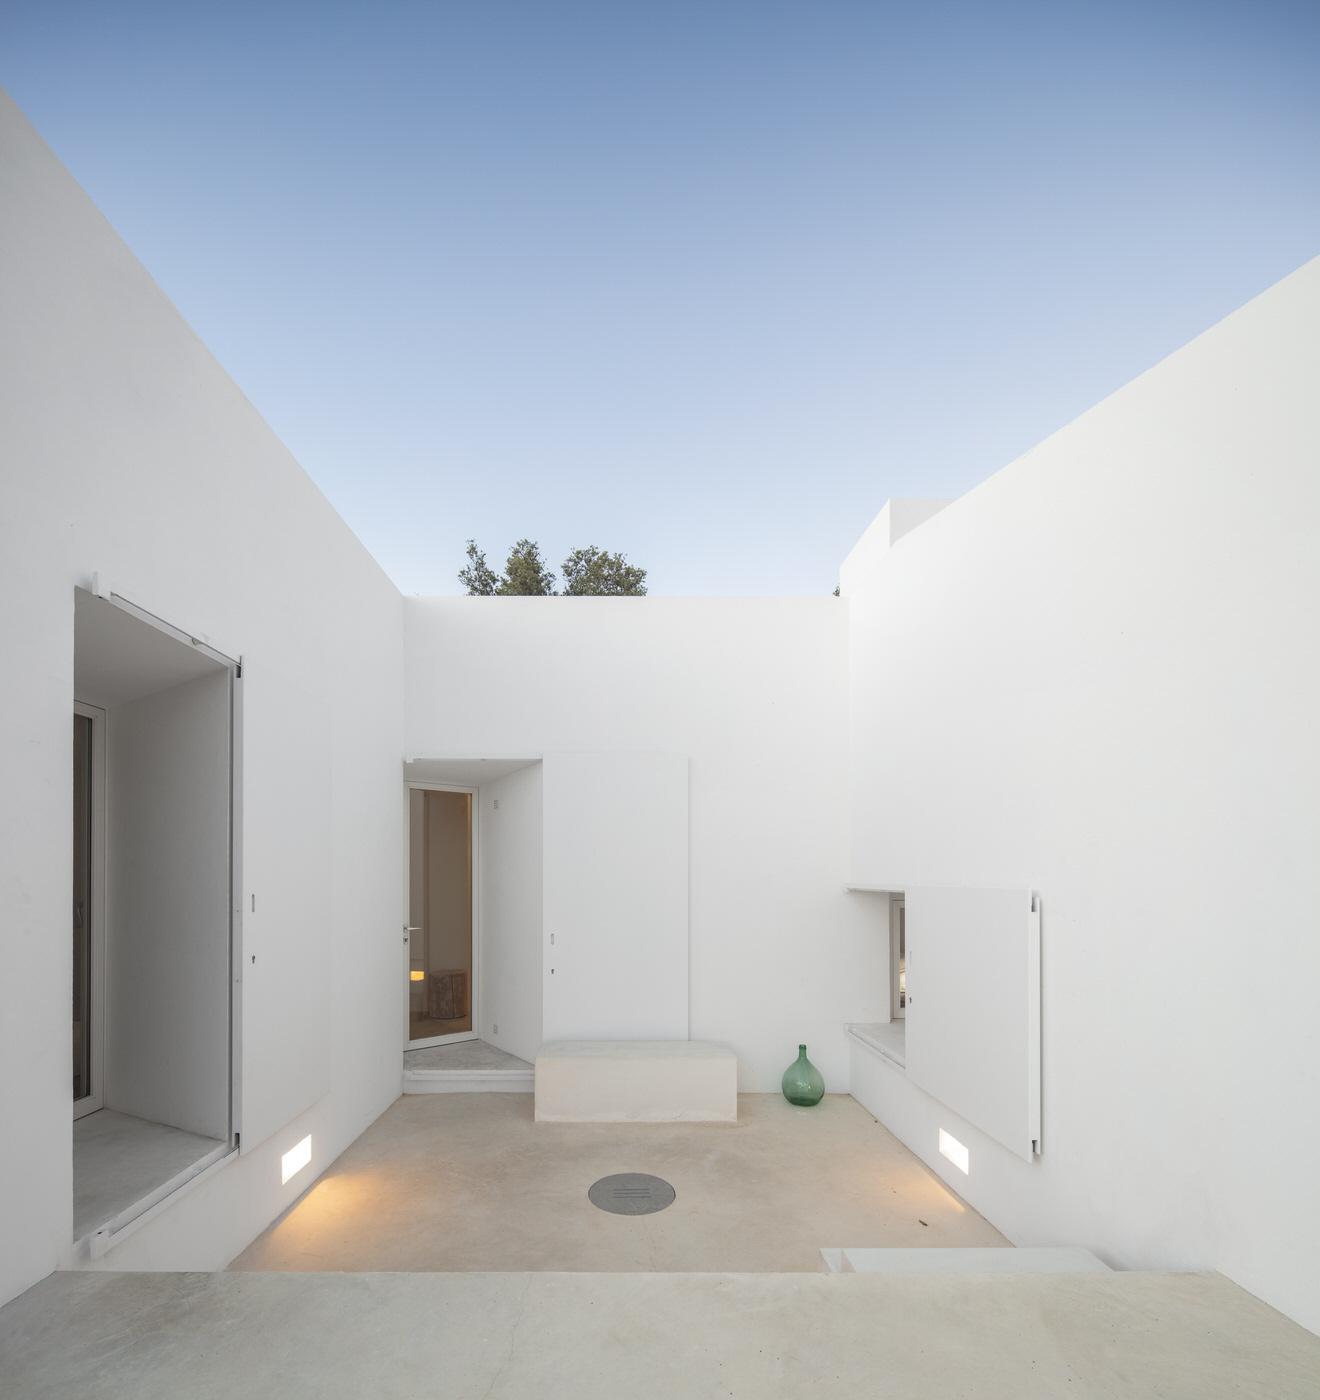 Zalig-Algarve-Casa-Luum-139-1_1